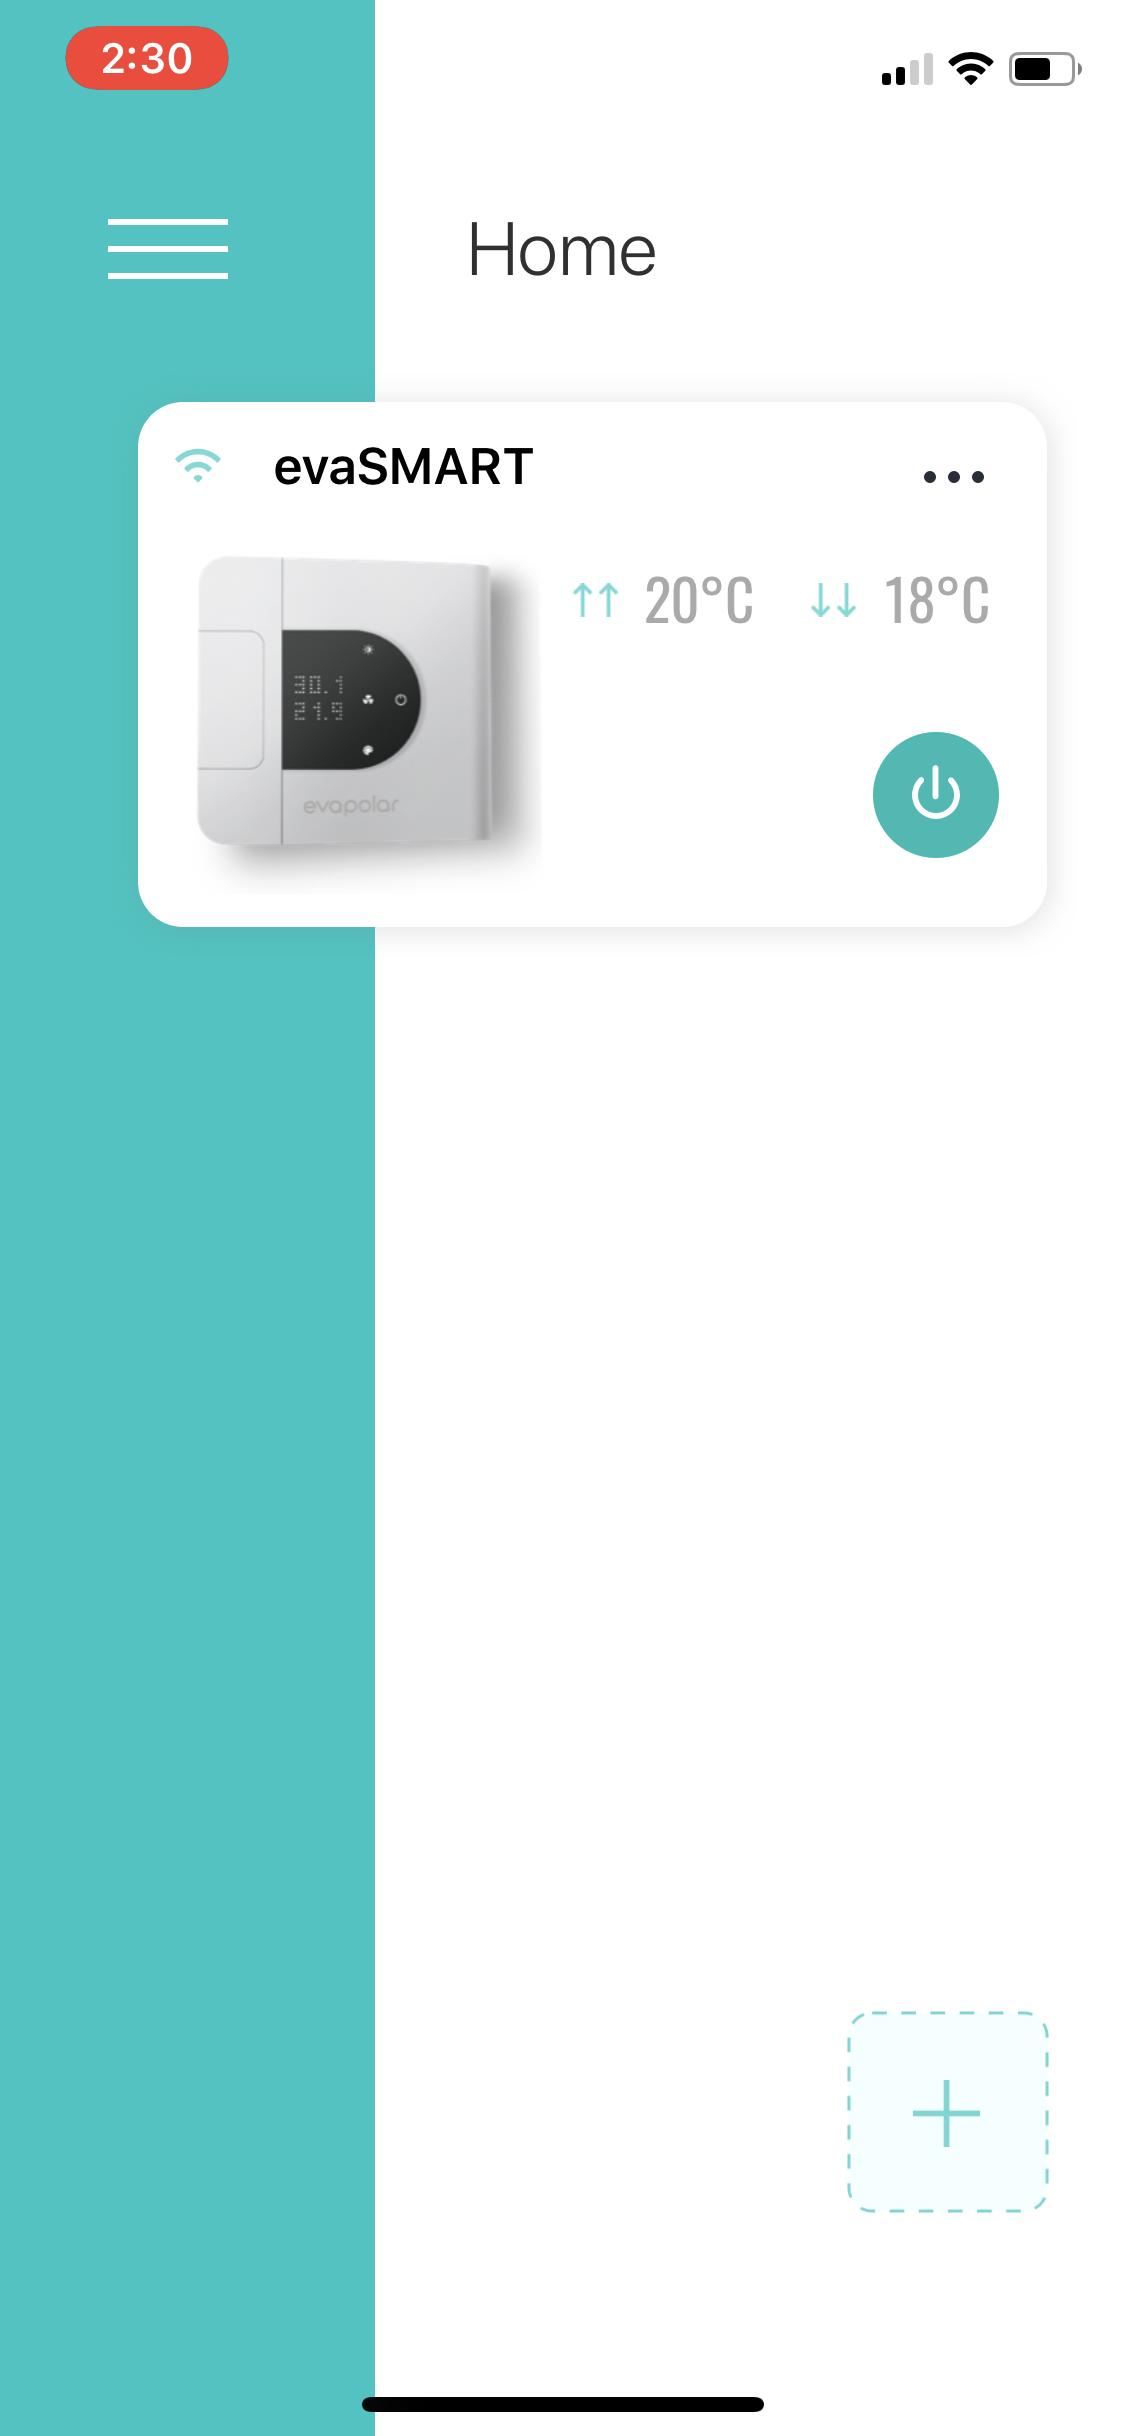 evaSMART app